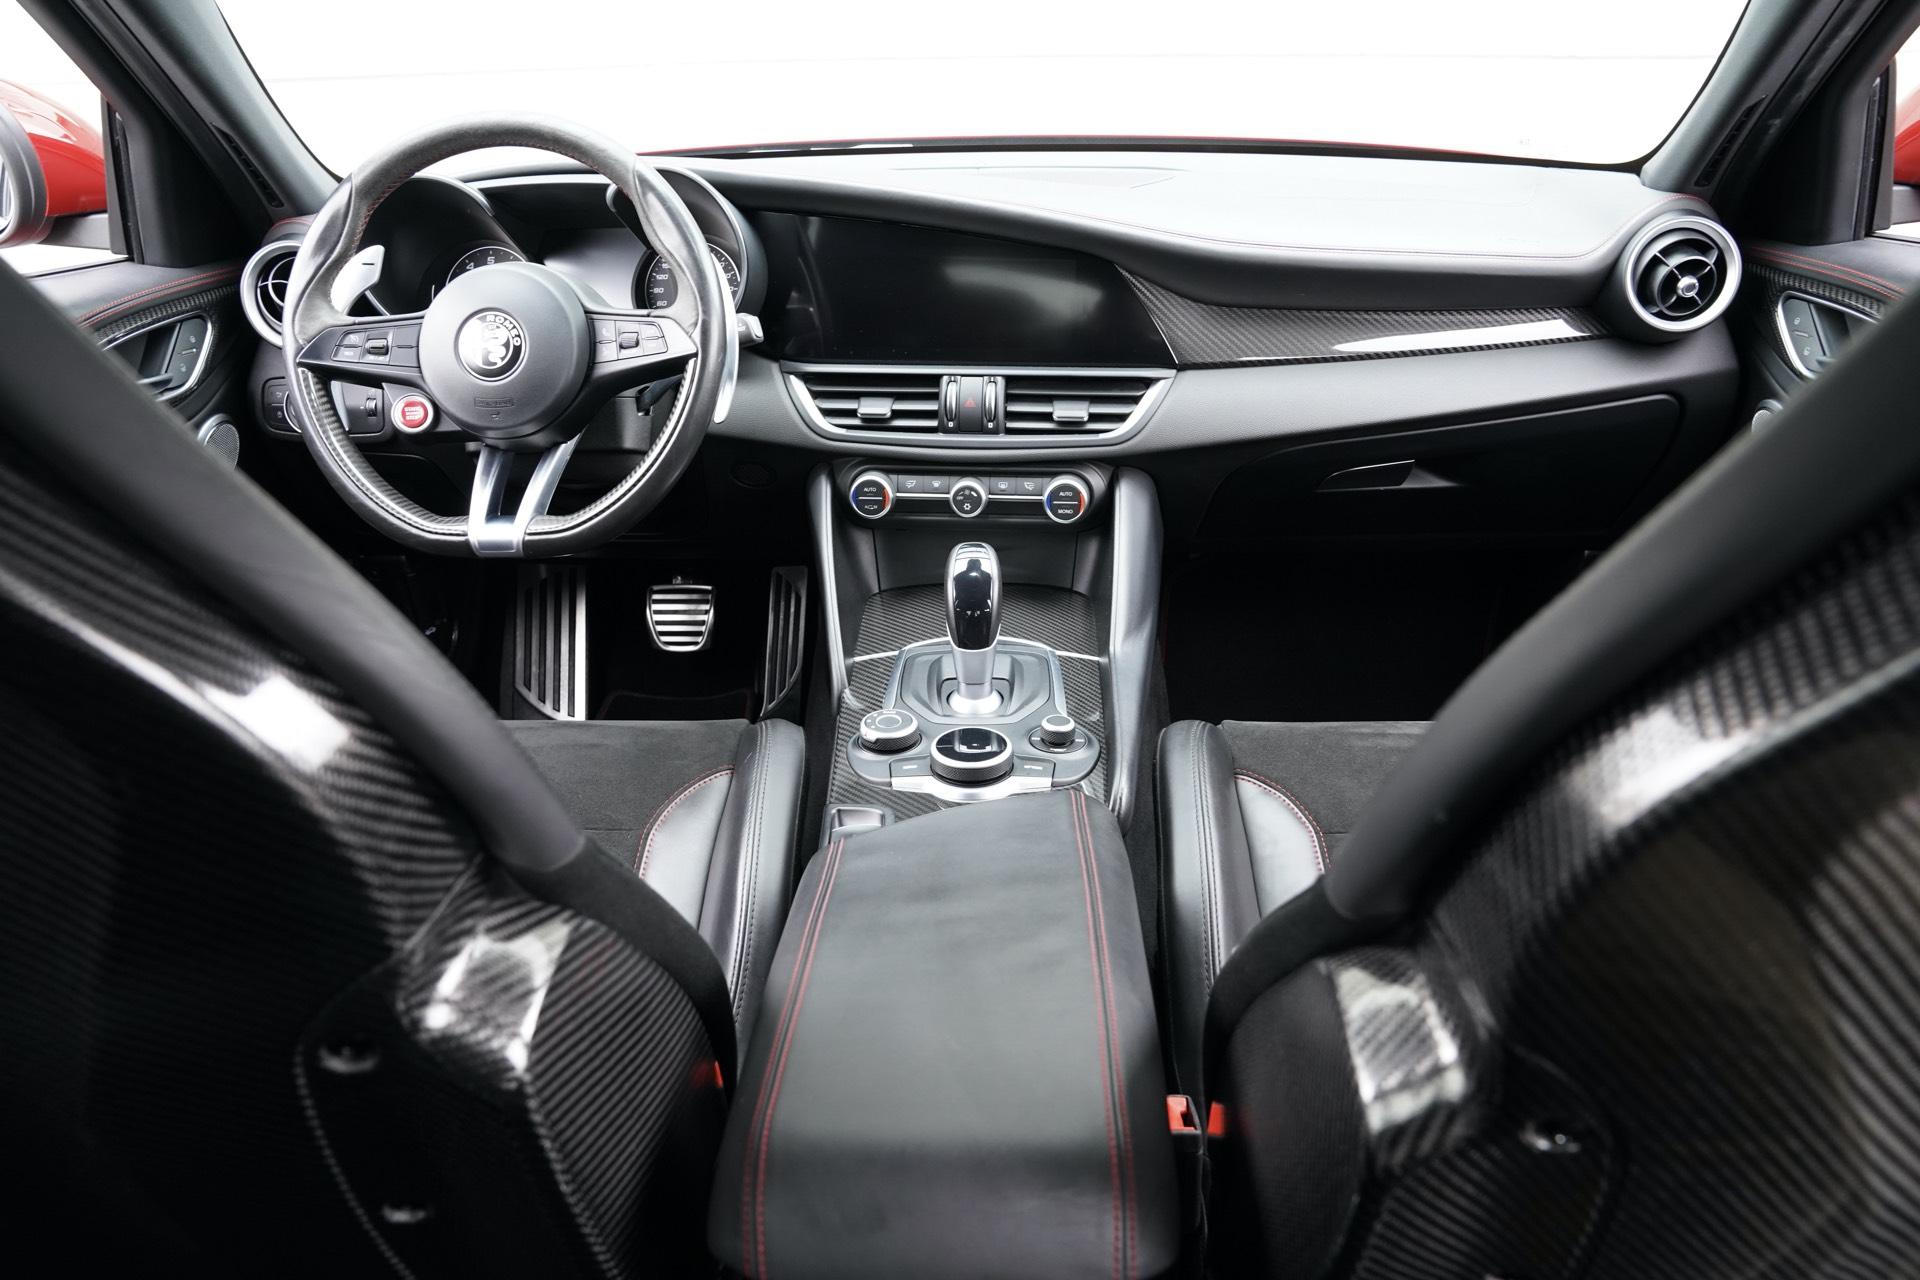 ALFA GIULIA QUADRIFOGLIO 2.9 V6 ROSSO COMP. 10.000KM